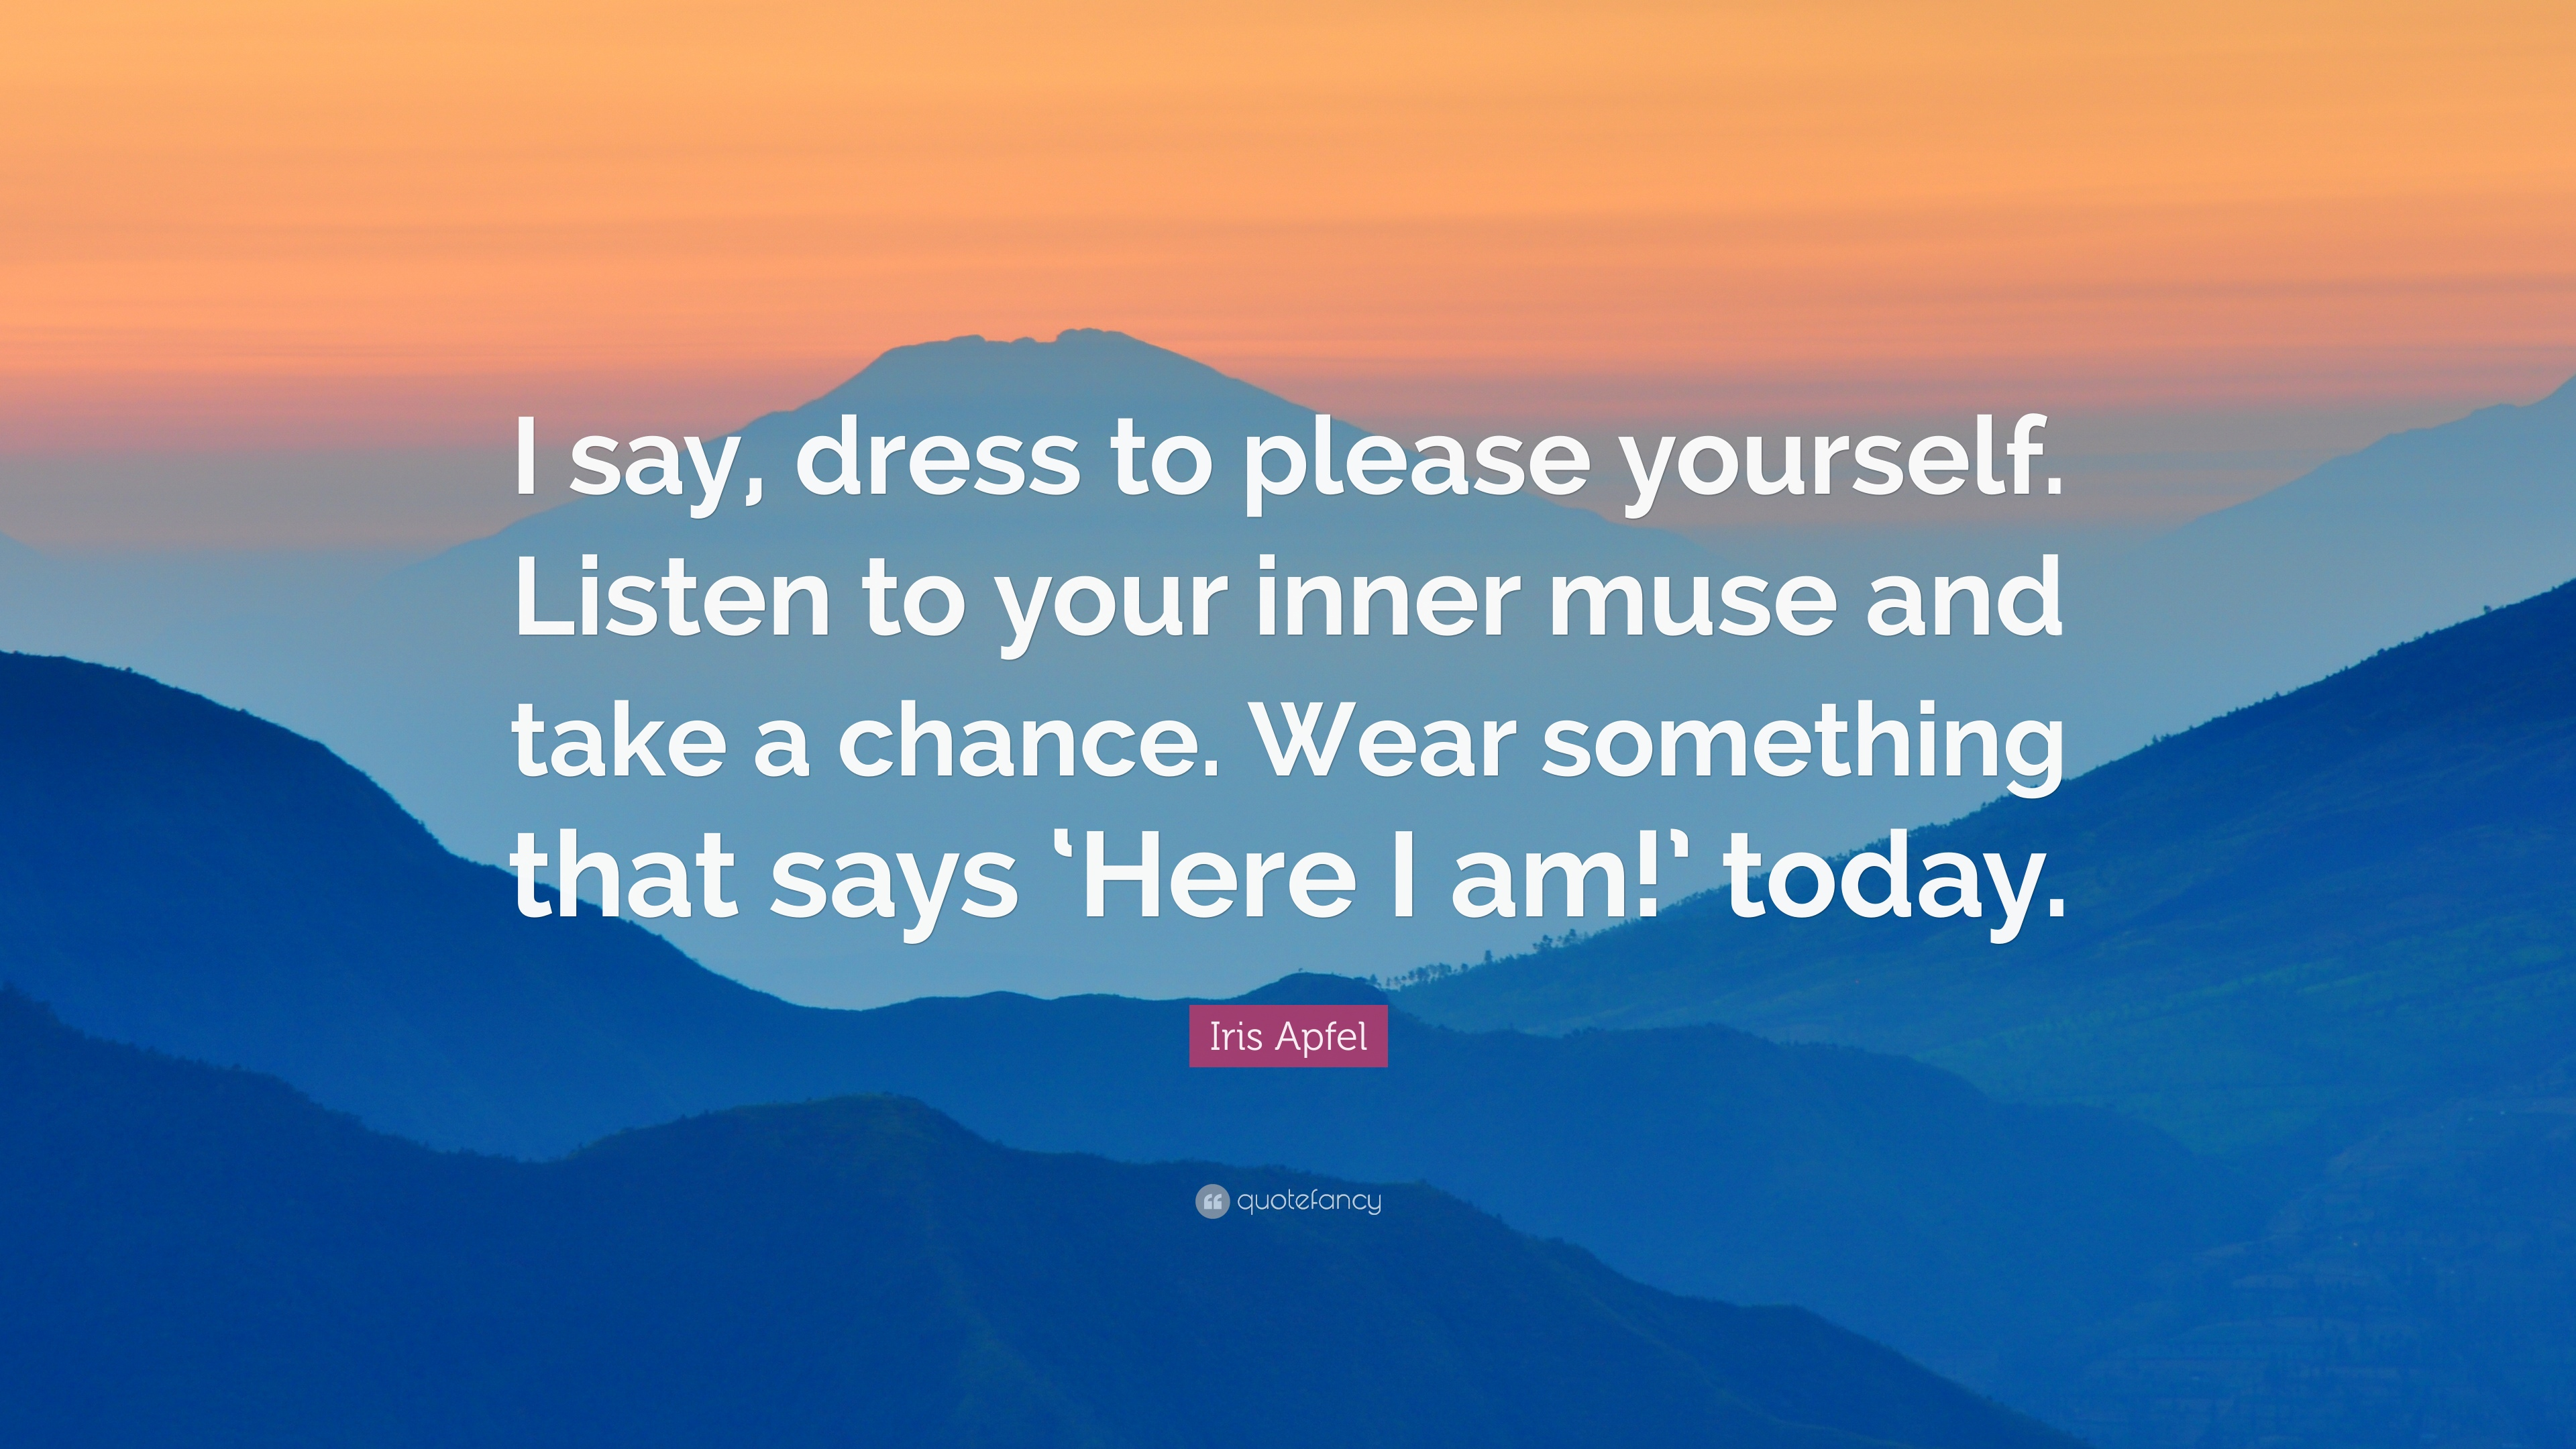 iris apfel quote i say dress to please yourself listen to your iris apfel quote i say dress to please yourself listen to your